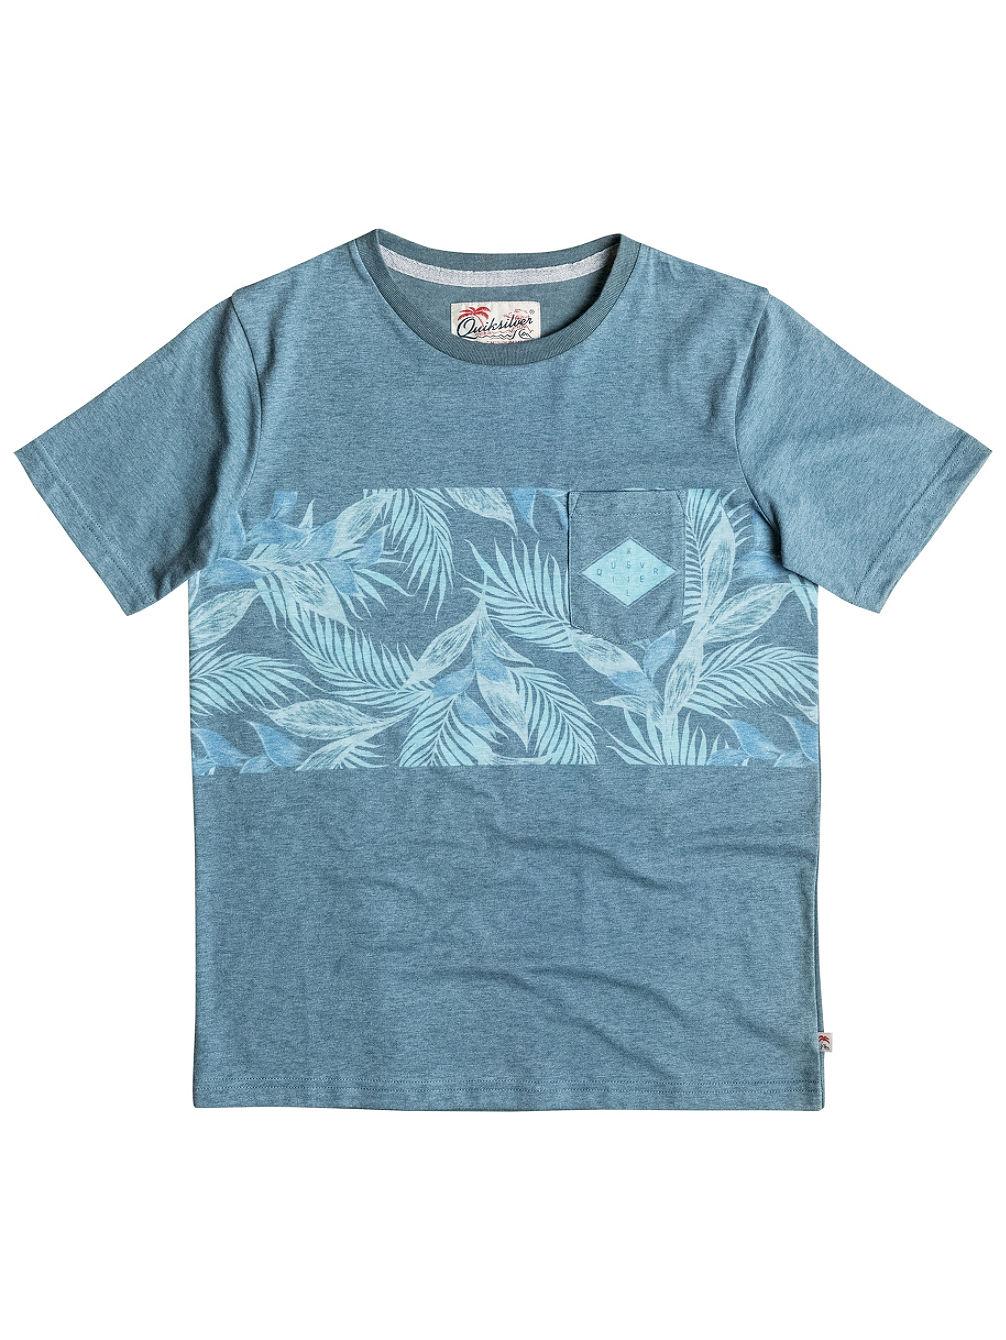 quiksilver faded time t shirt jungen online kaufen bei blue. Black Bedroom Furniture Sets. Home Design Ideas